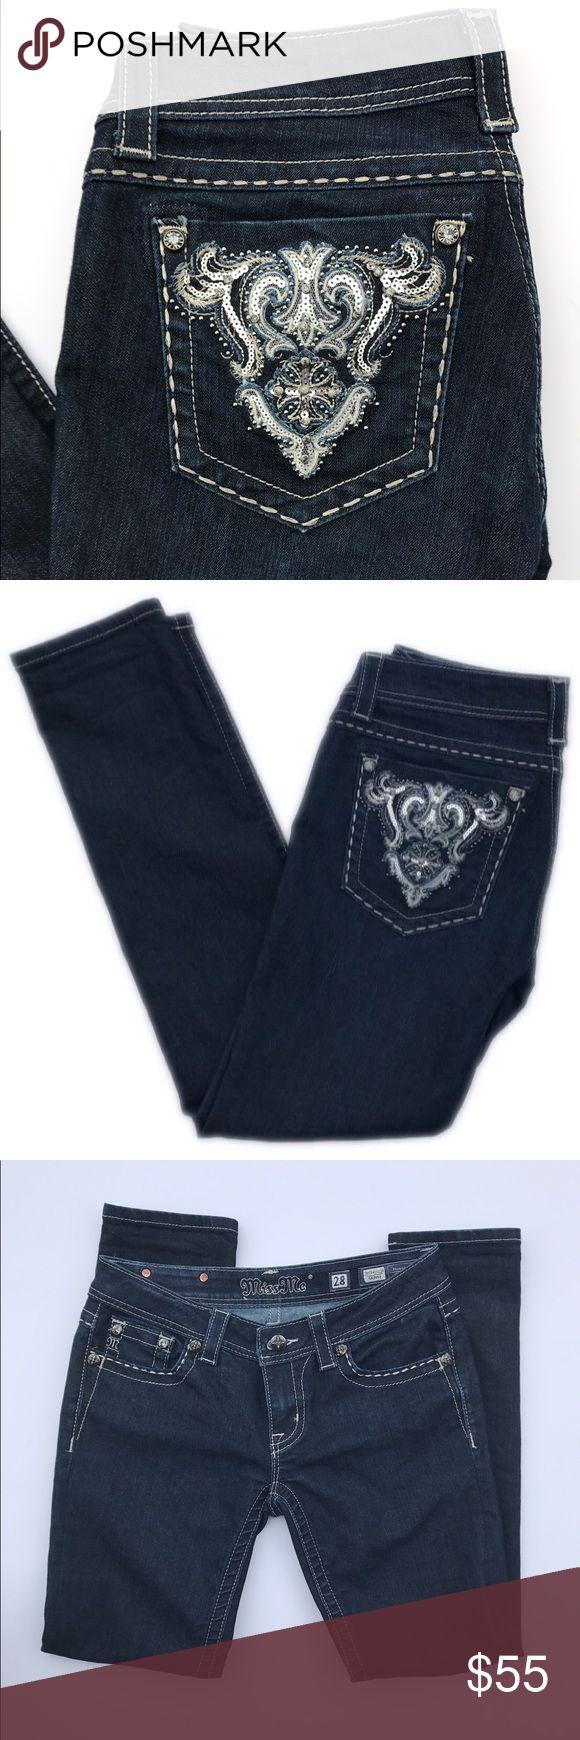 Miss Me Sunny jeans Size 28 Miss Me skinny jeans 💎 Like new! 💎 style JE5341S12R 💎 Dark wash 💎 Miss Me Jeans Skinny